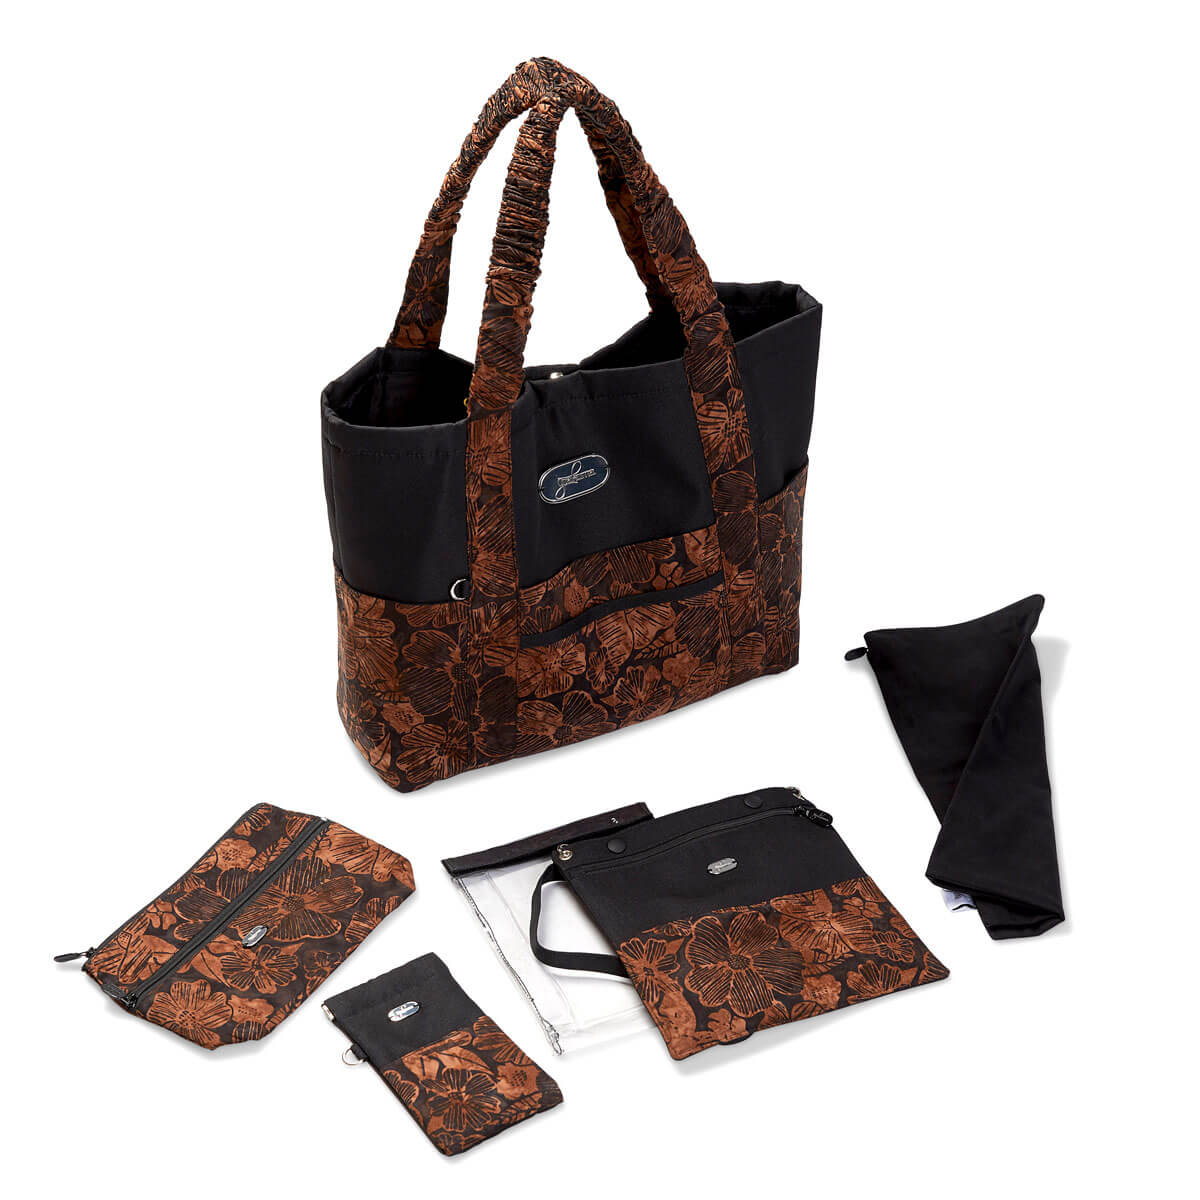 8b0a92e7f3 Tote Bag Set Expresso Bean - Opakuma